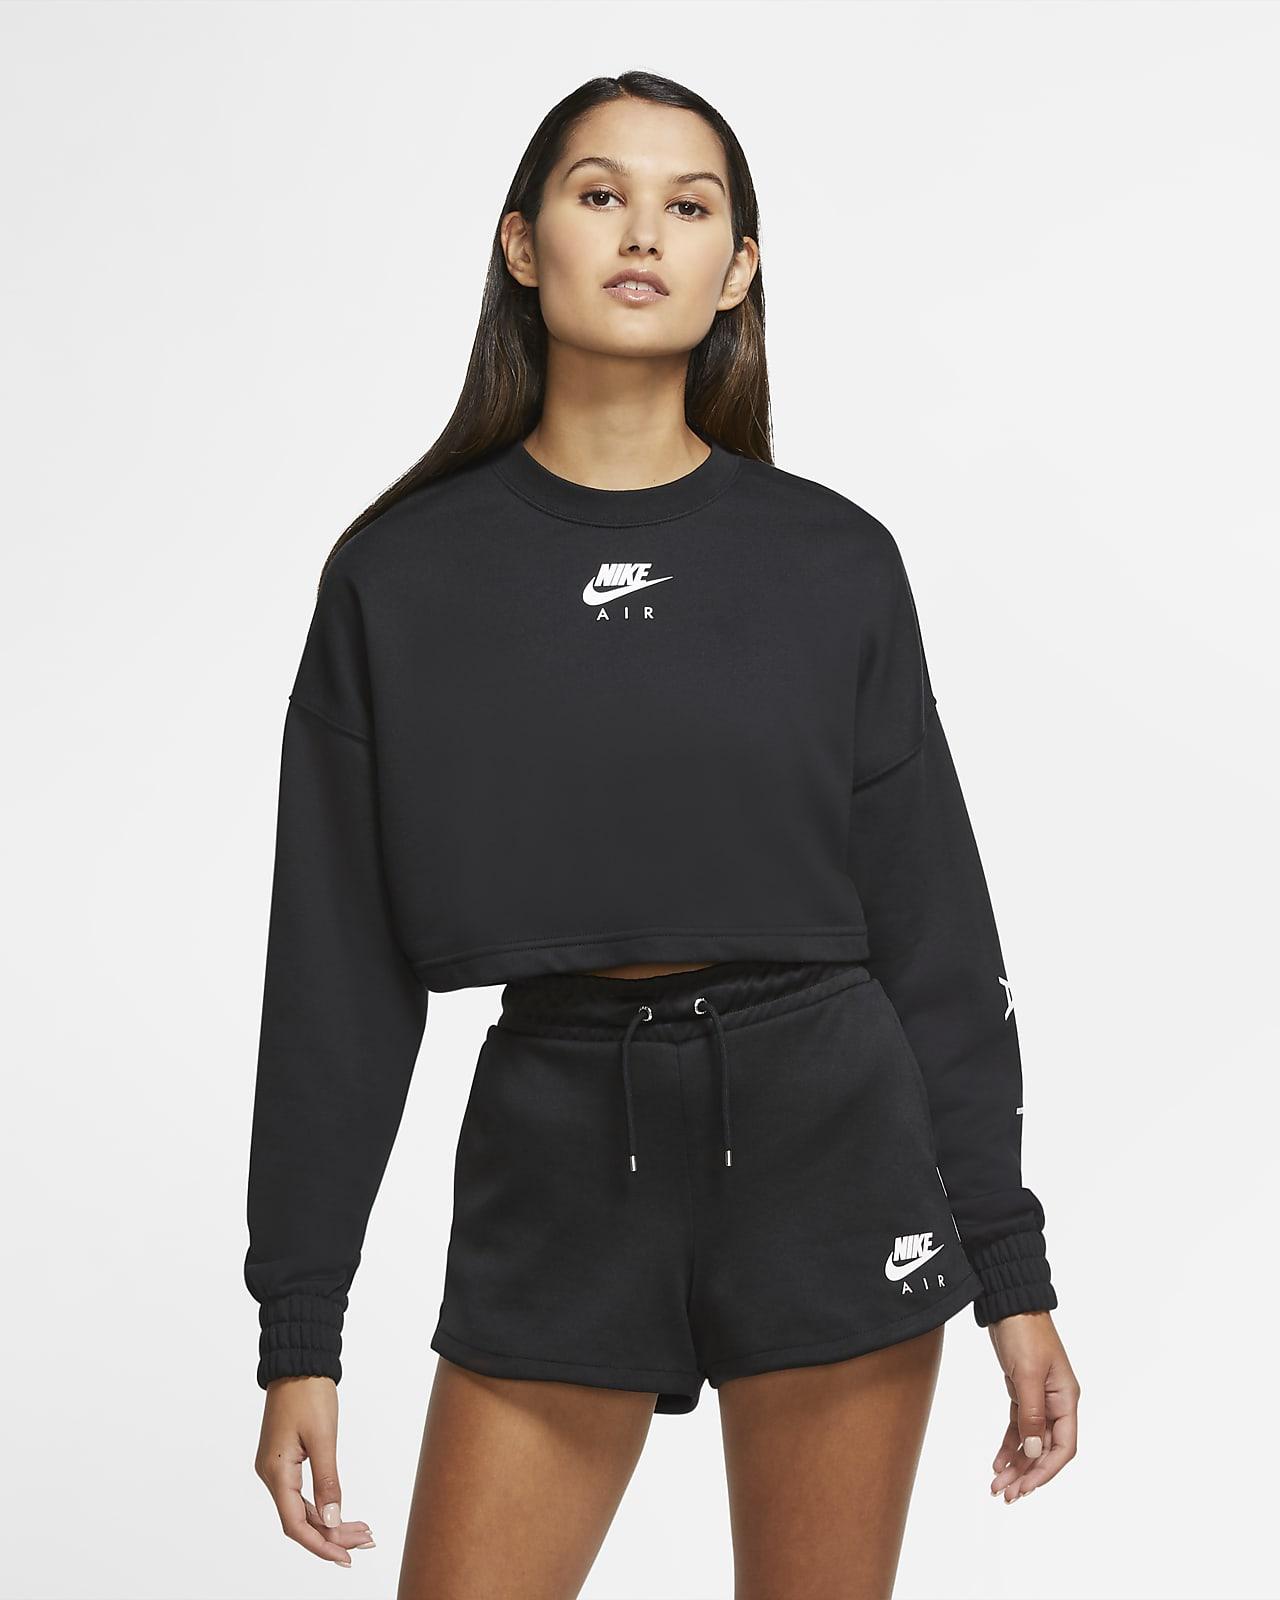 Haut court en tissu Fleece Nike Air pour Femme